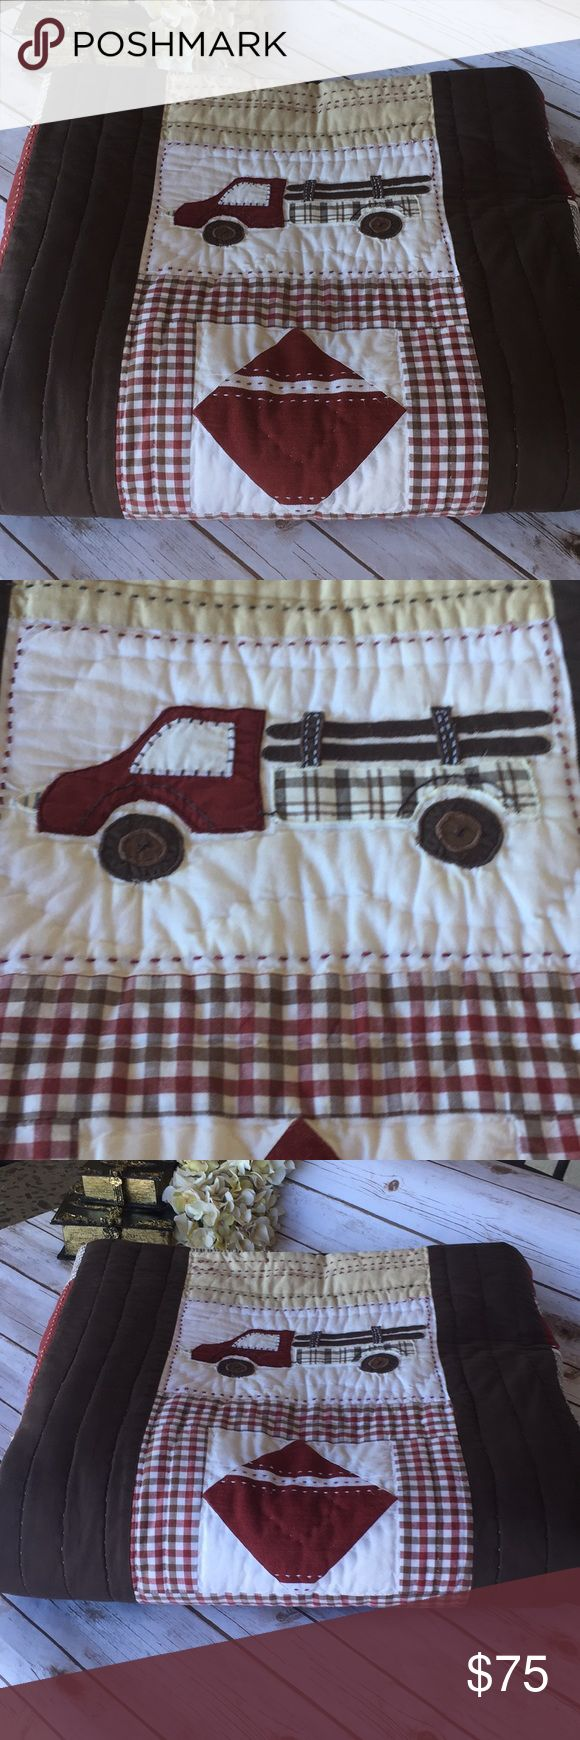 Twin Comforter Twin comforter, Pottery barn kids bedding